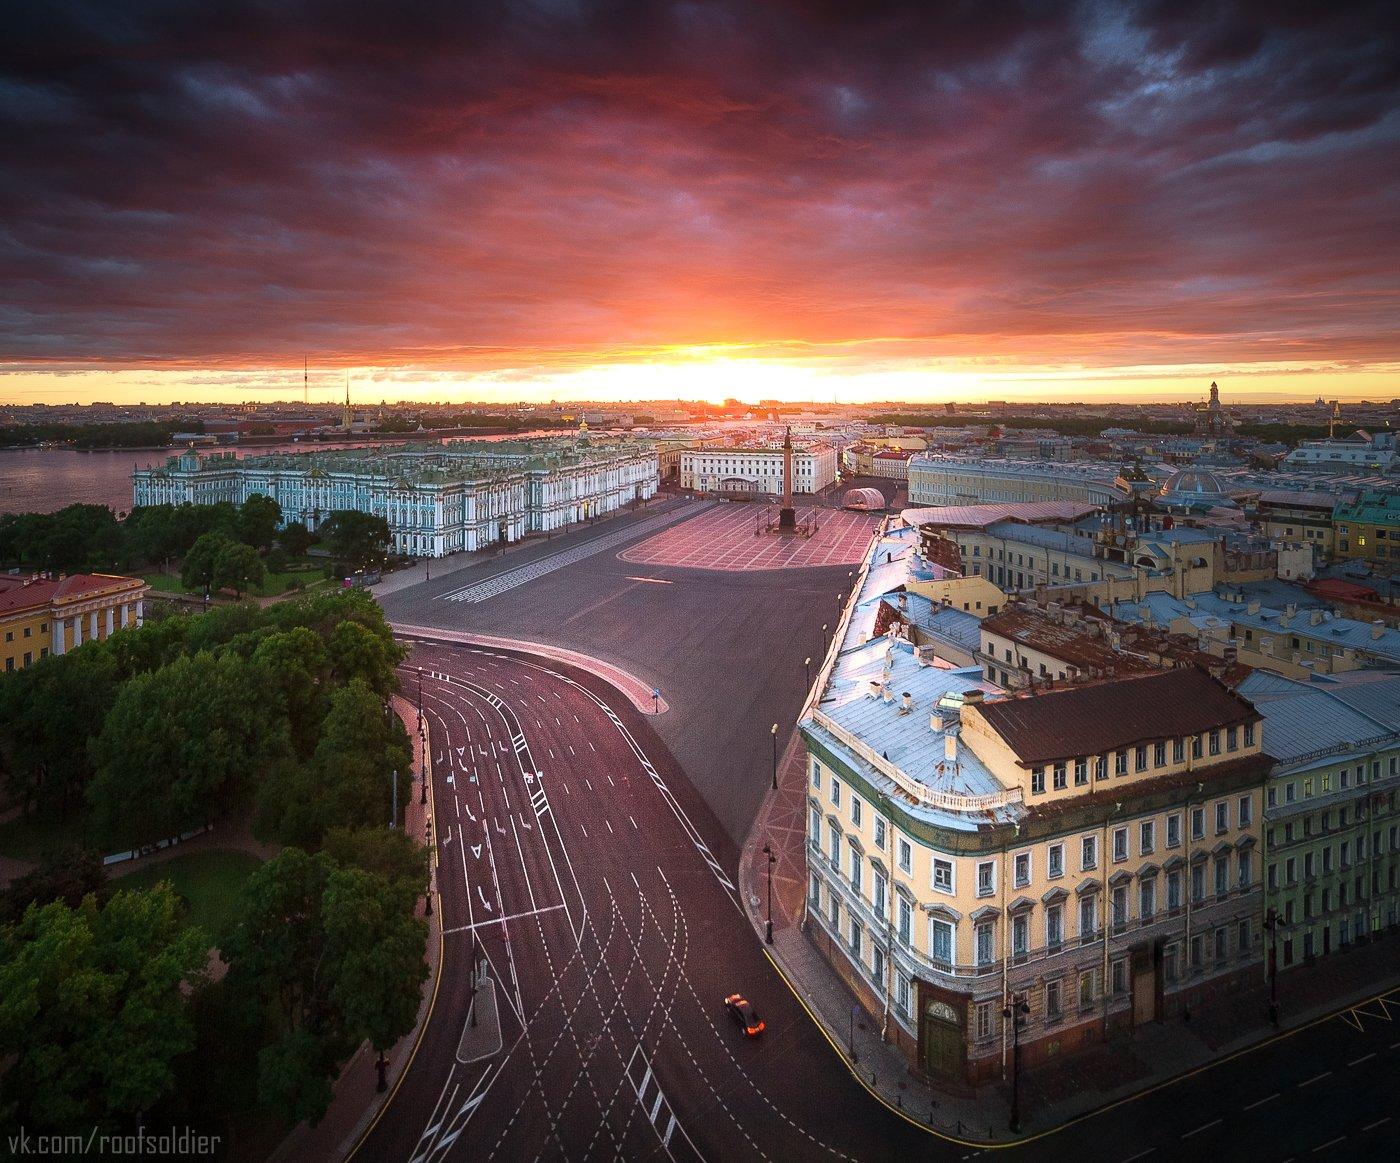 Санкт-Петербург, рассвет, закат, крыша, город, пейзаж, архитектура, Питер, Голубев Алексей